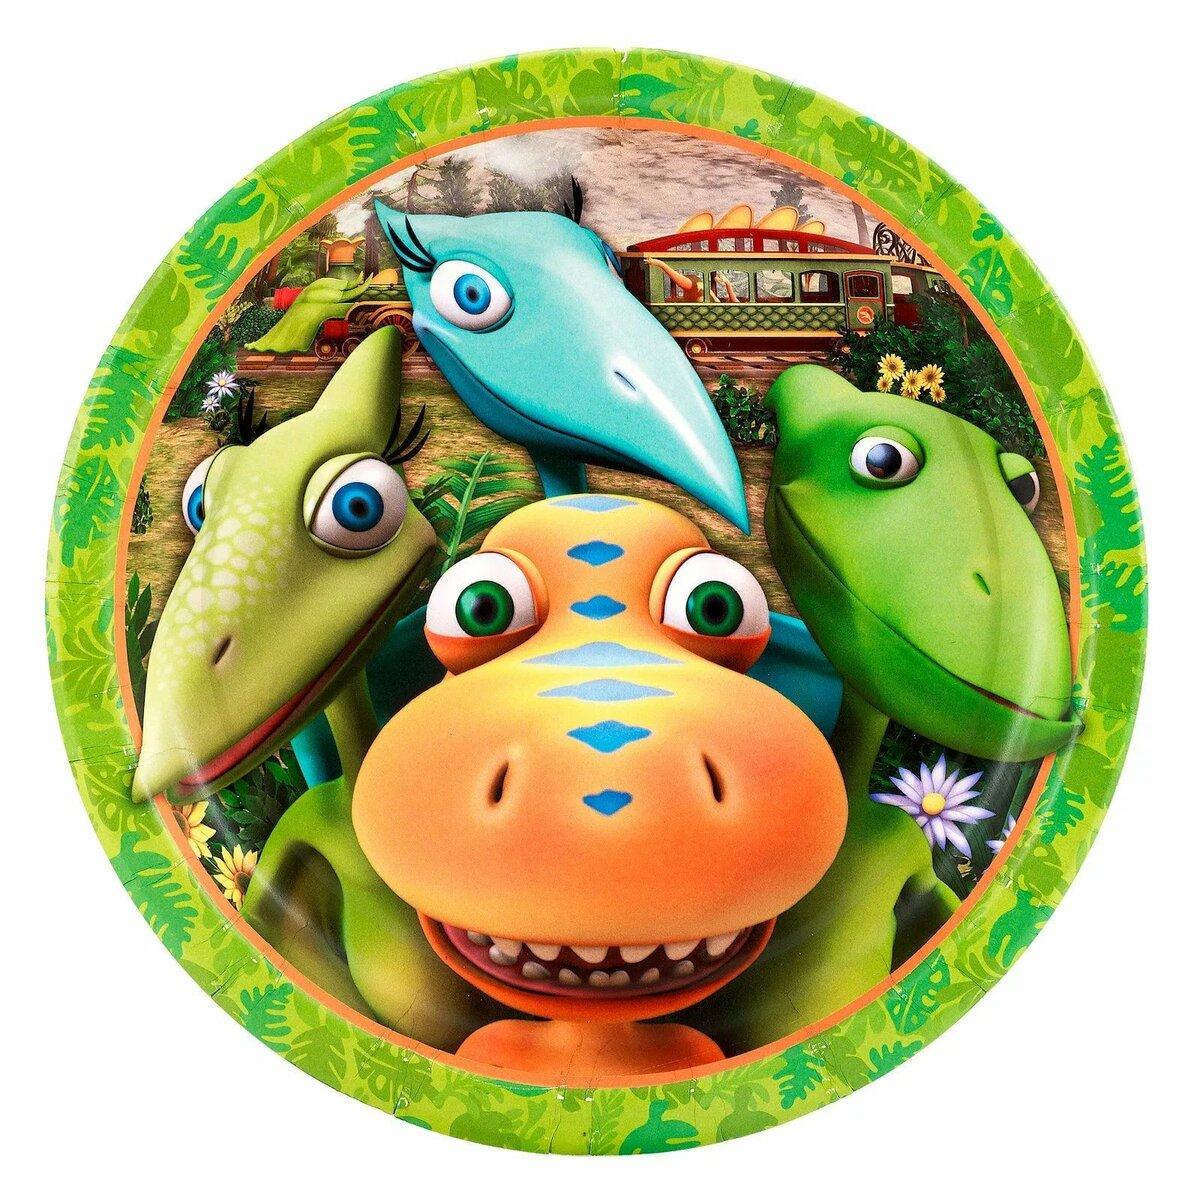 норма динозавр картинка на торт круглая уже почти